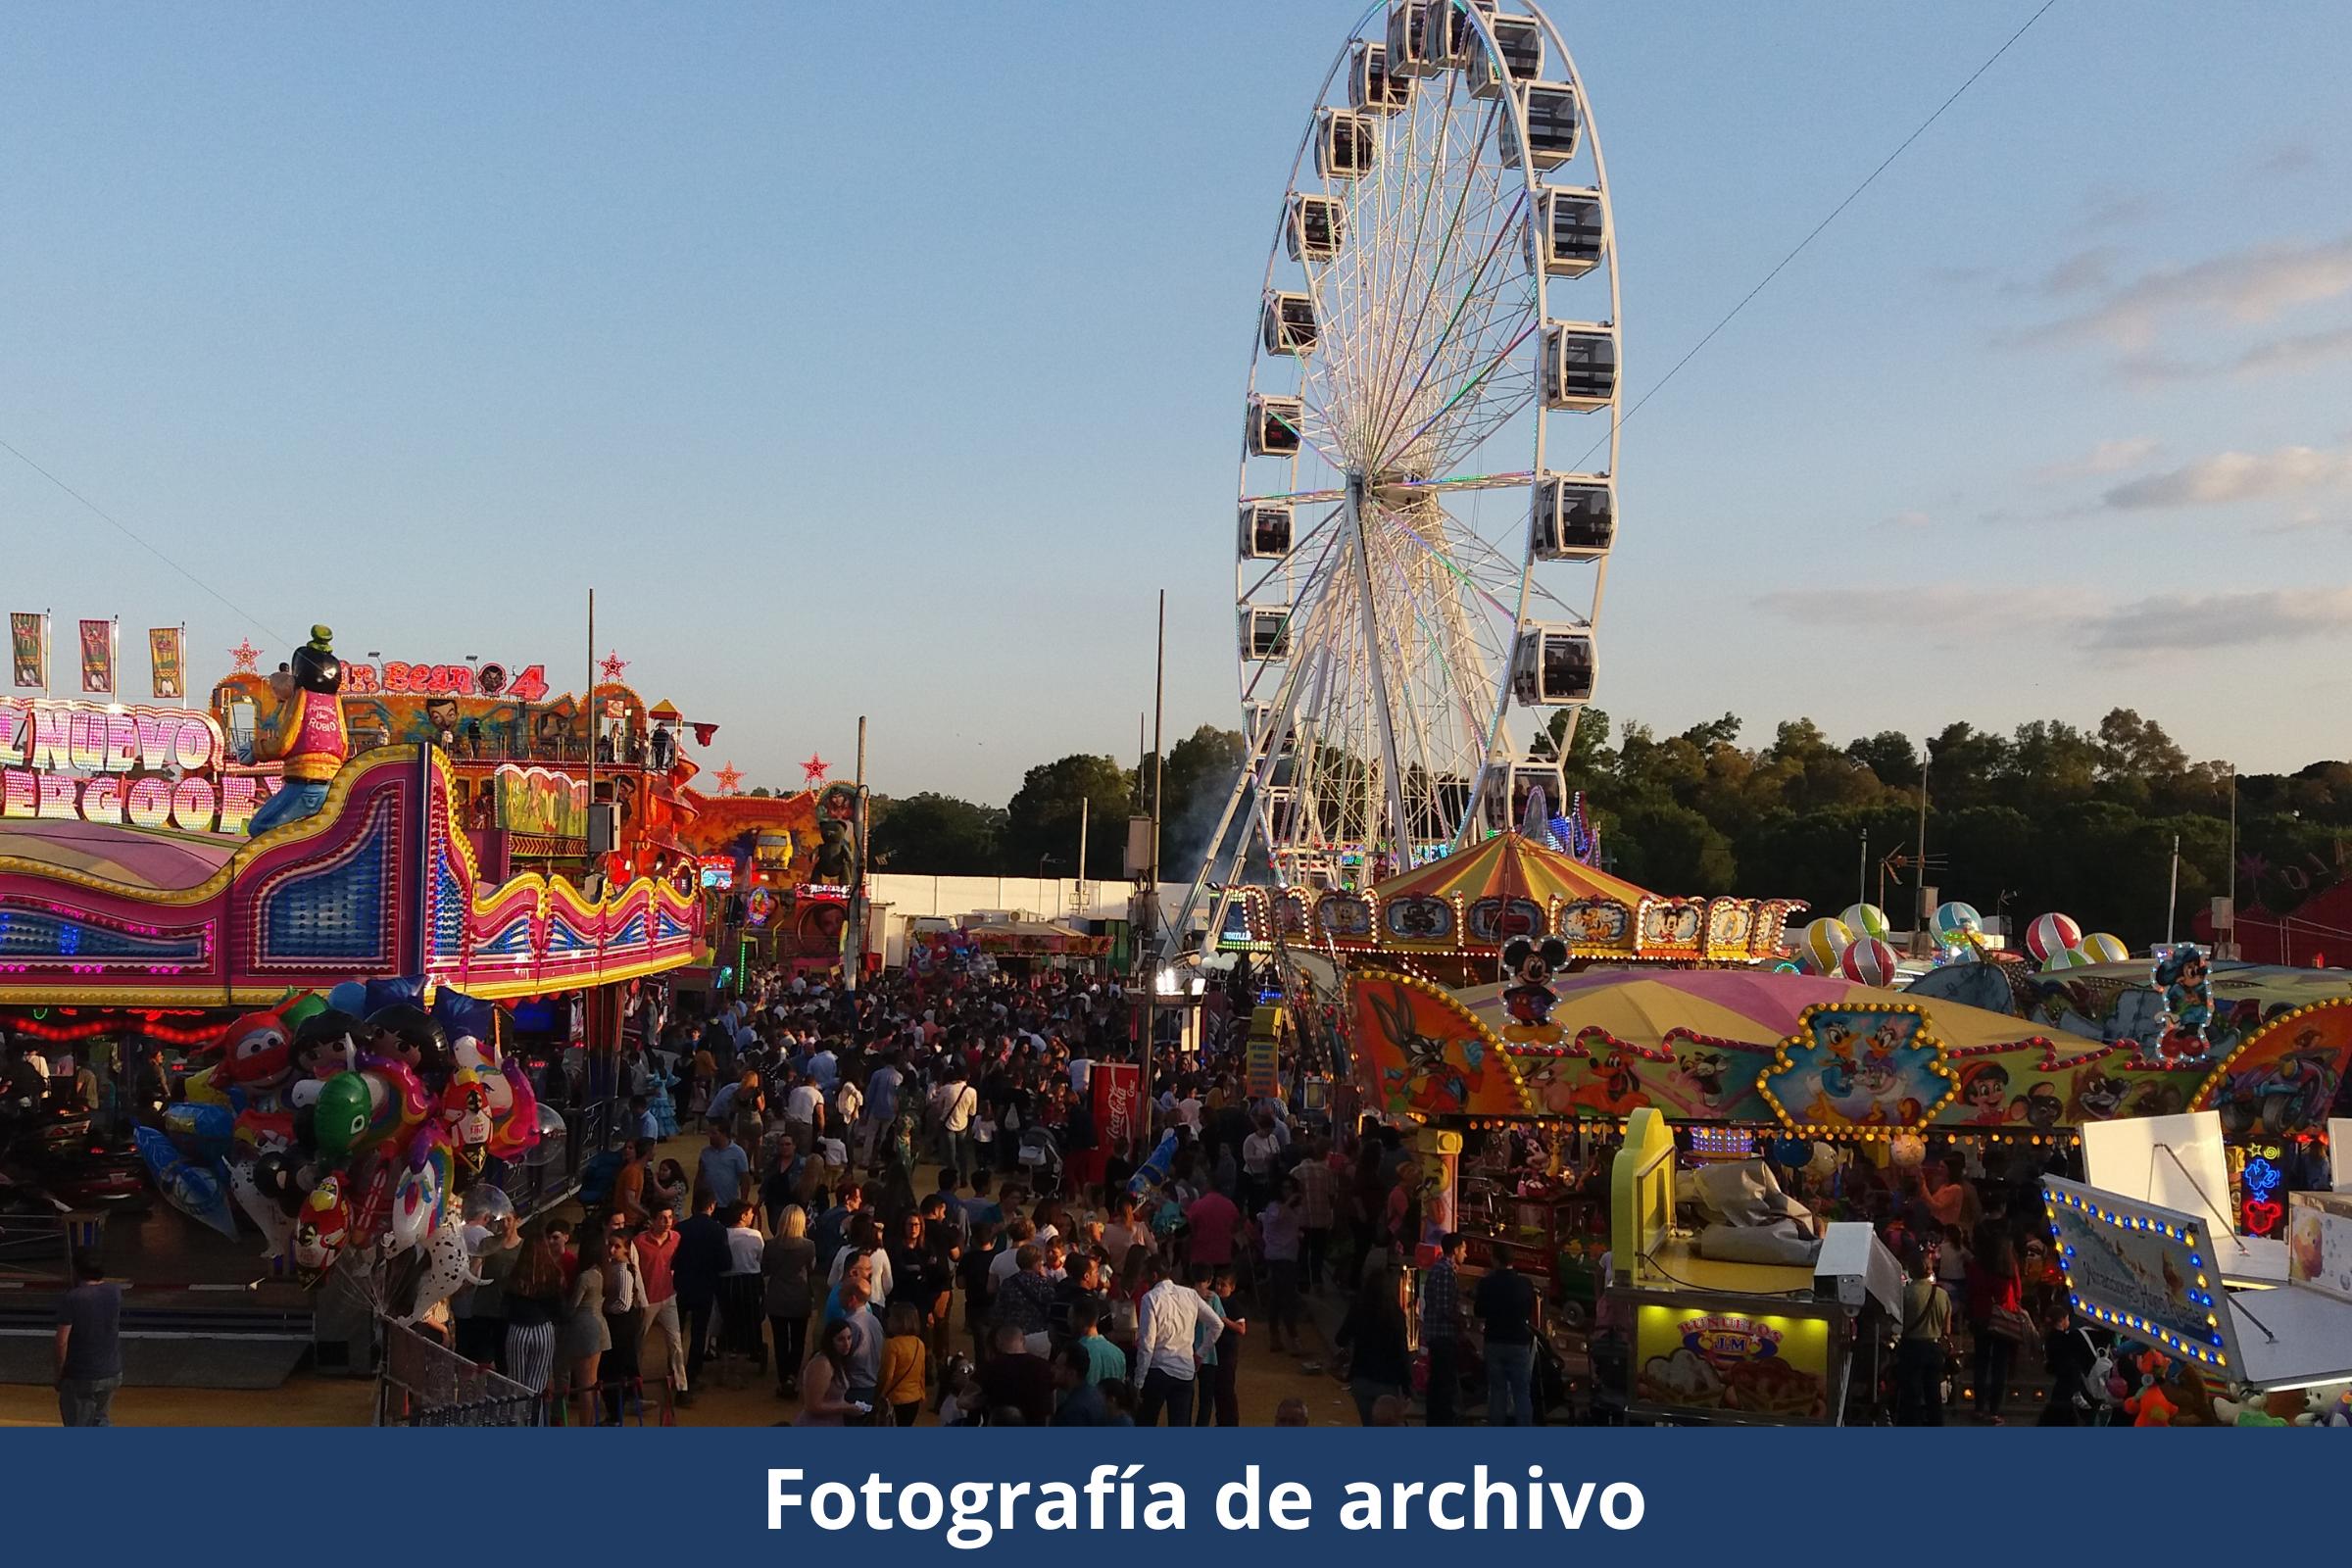 Foto archivo atracciones feria